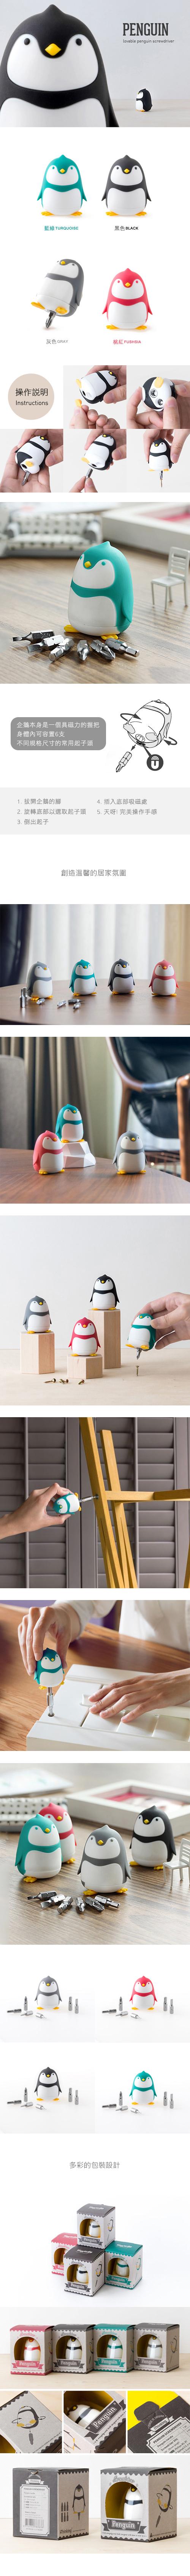 iThinking 企鵝螺絲起子組 (6入) 灰